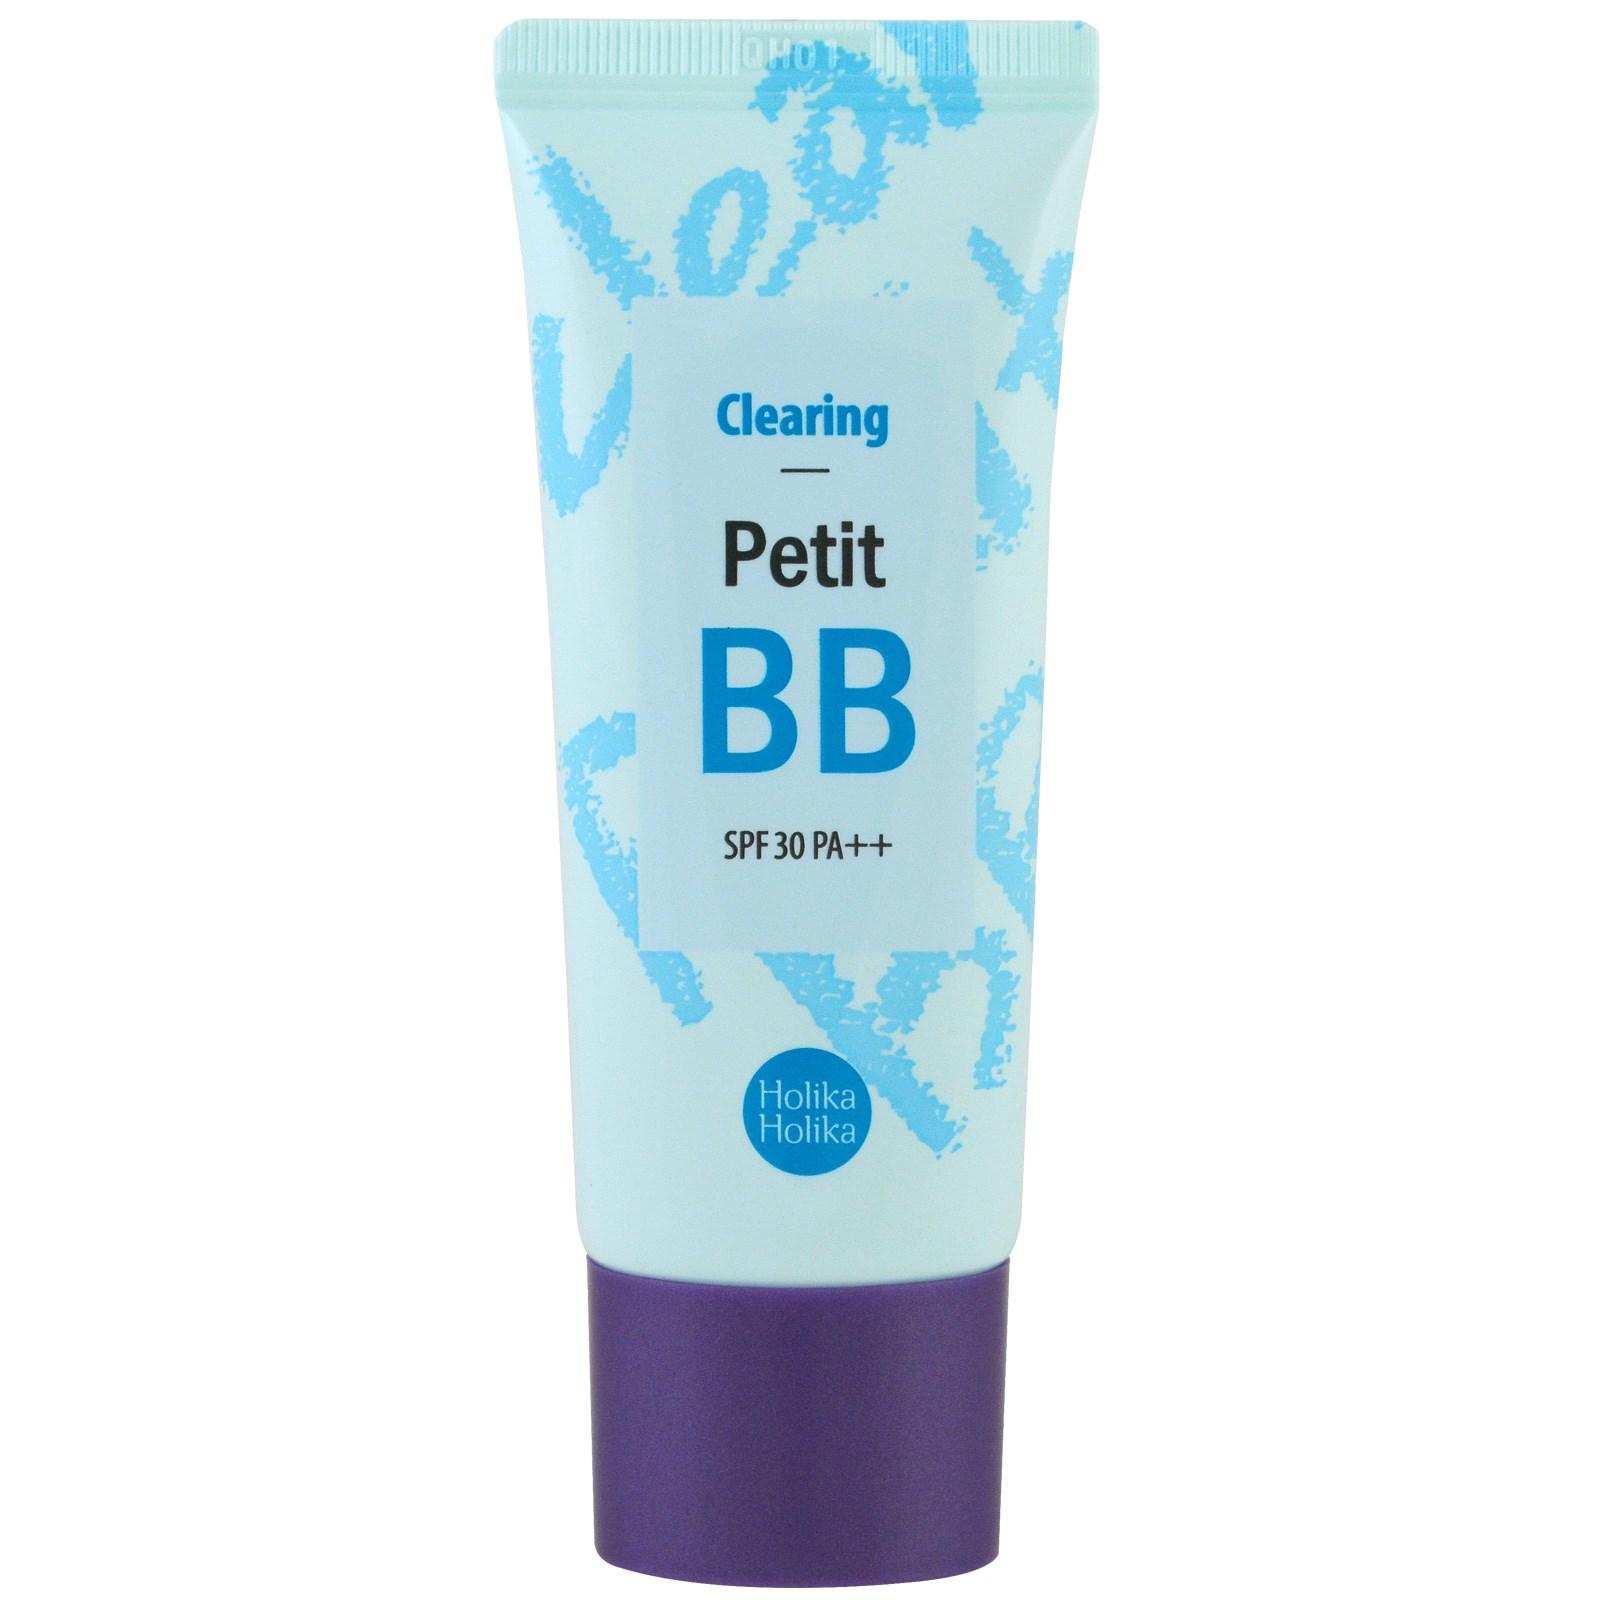 Holika Holika, Clearing Petit BB, SPF 30, 30 ml